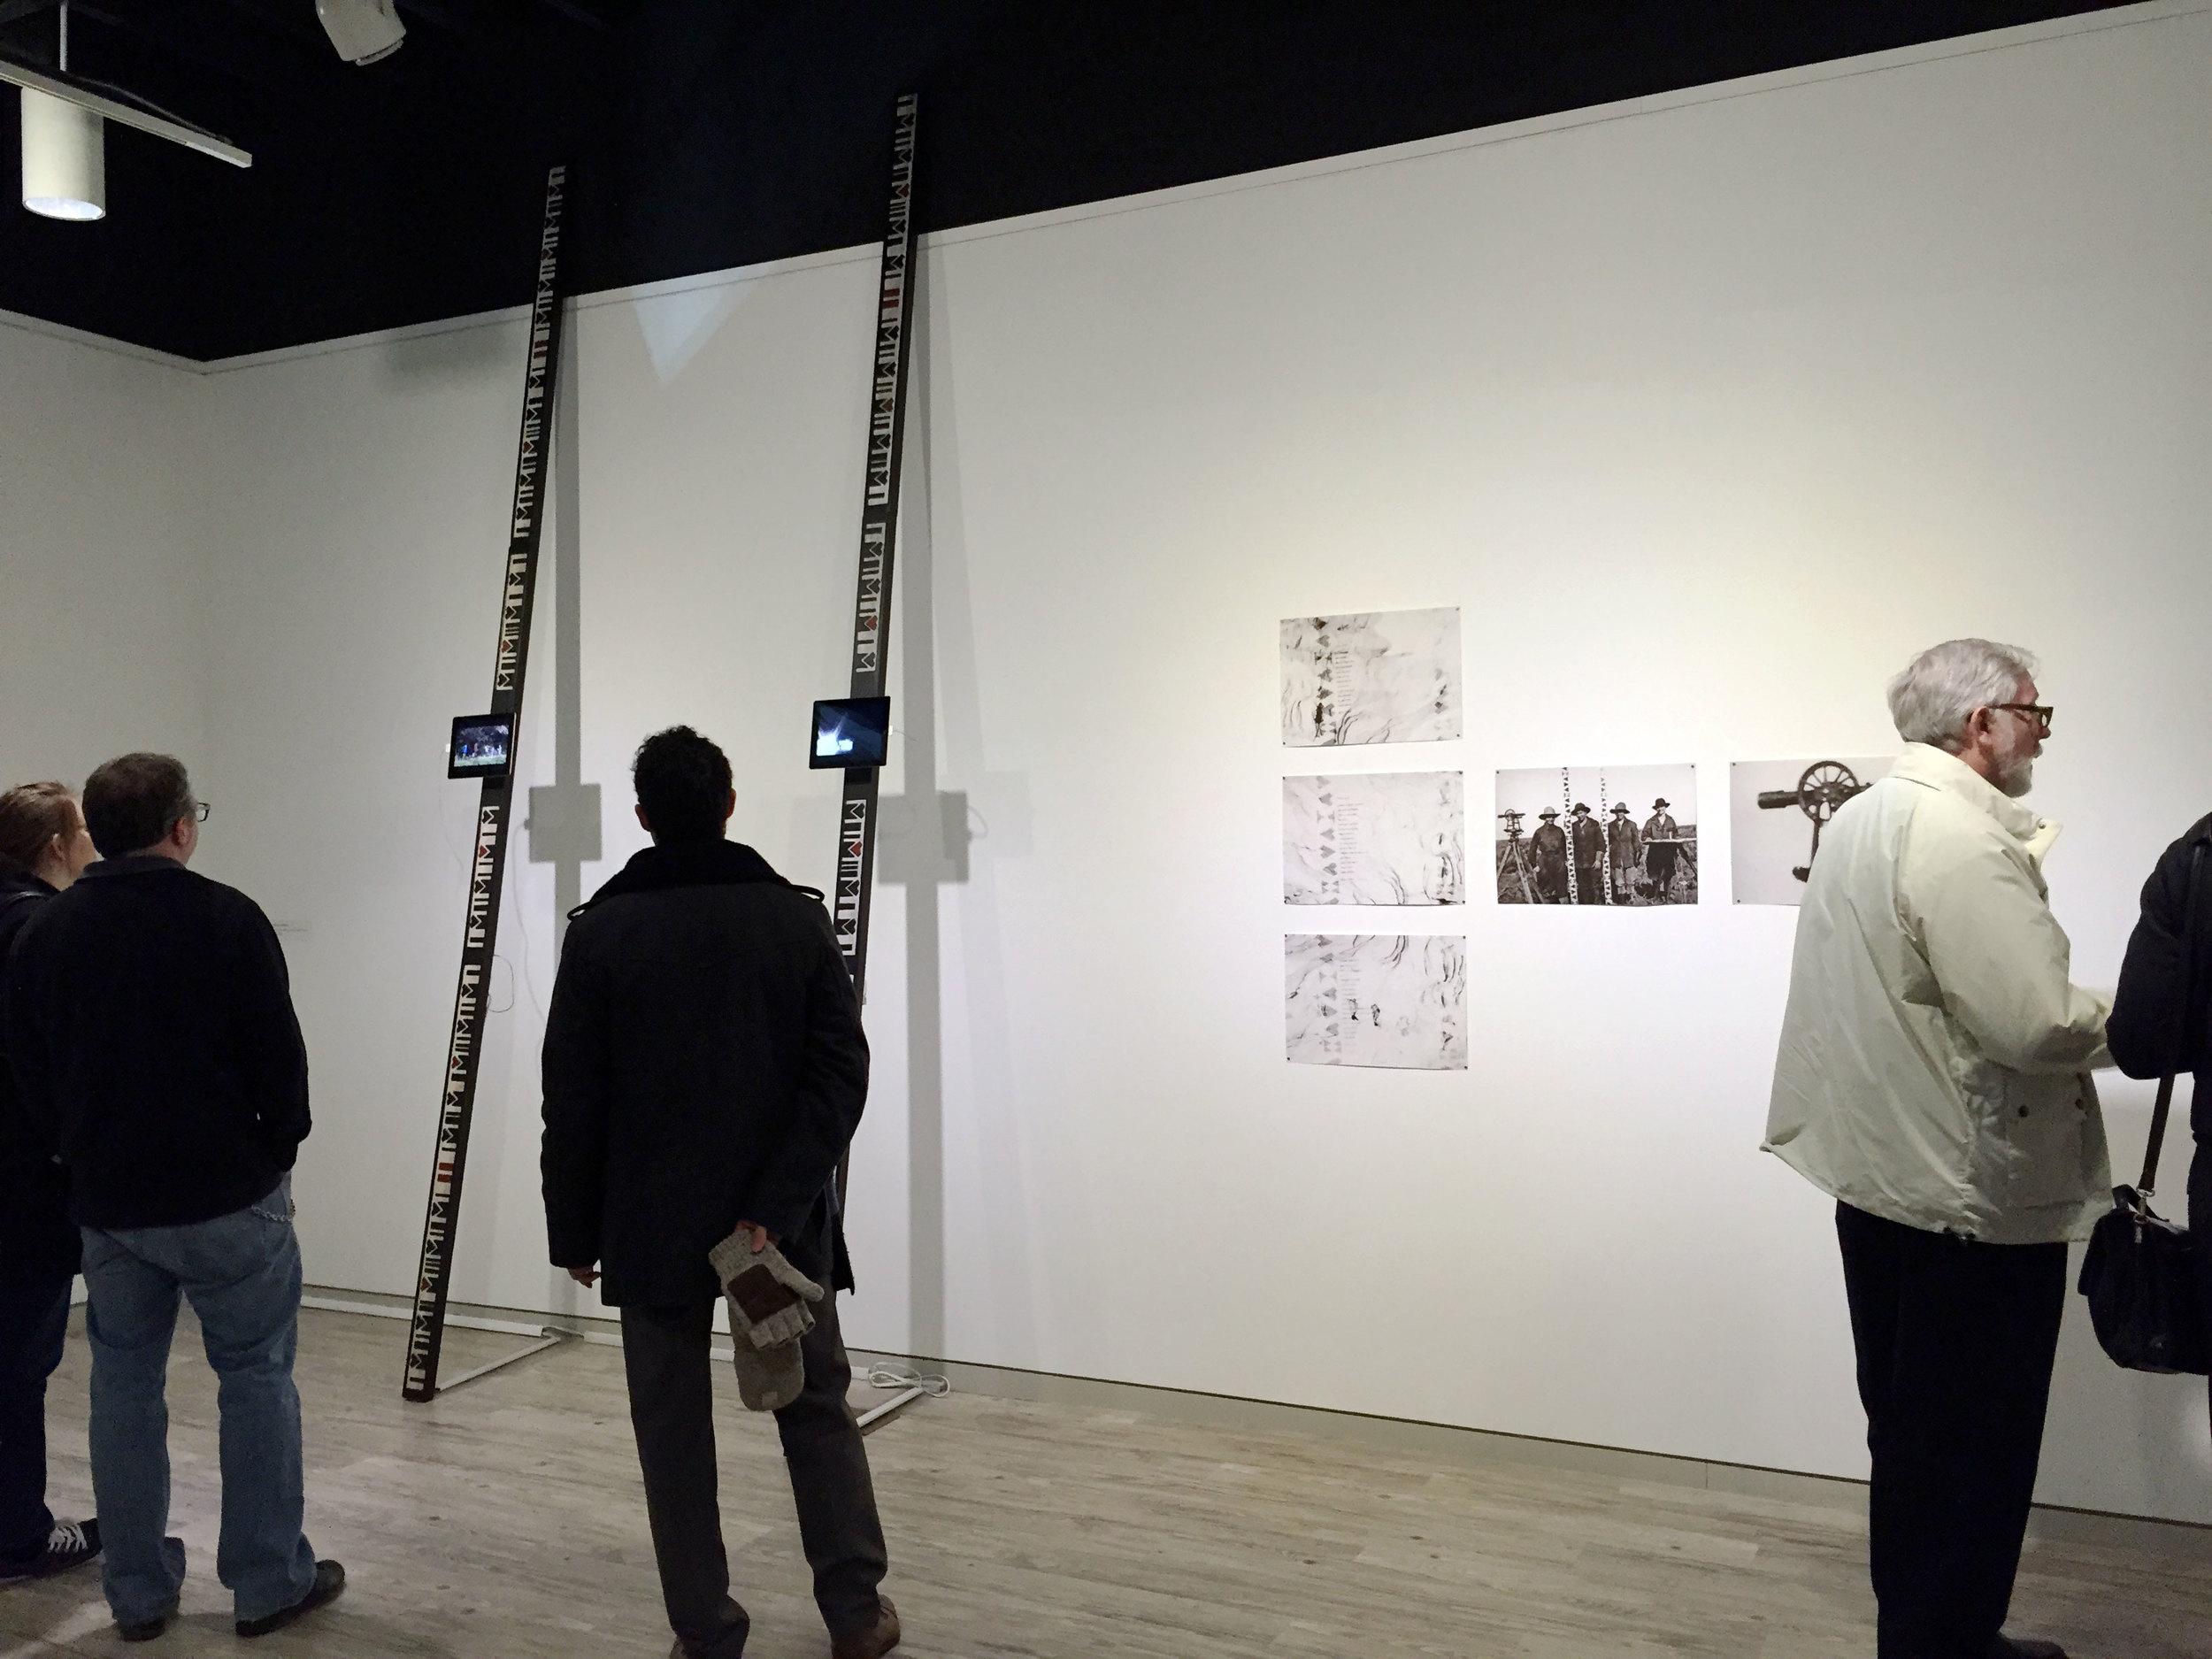 Arlington Arts Center, 2015